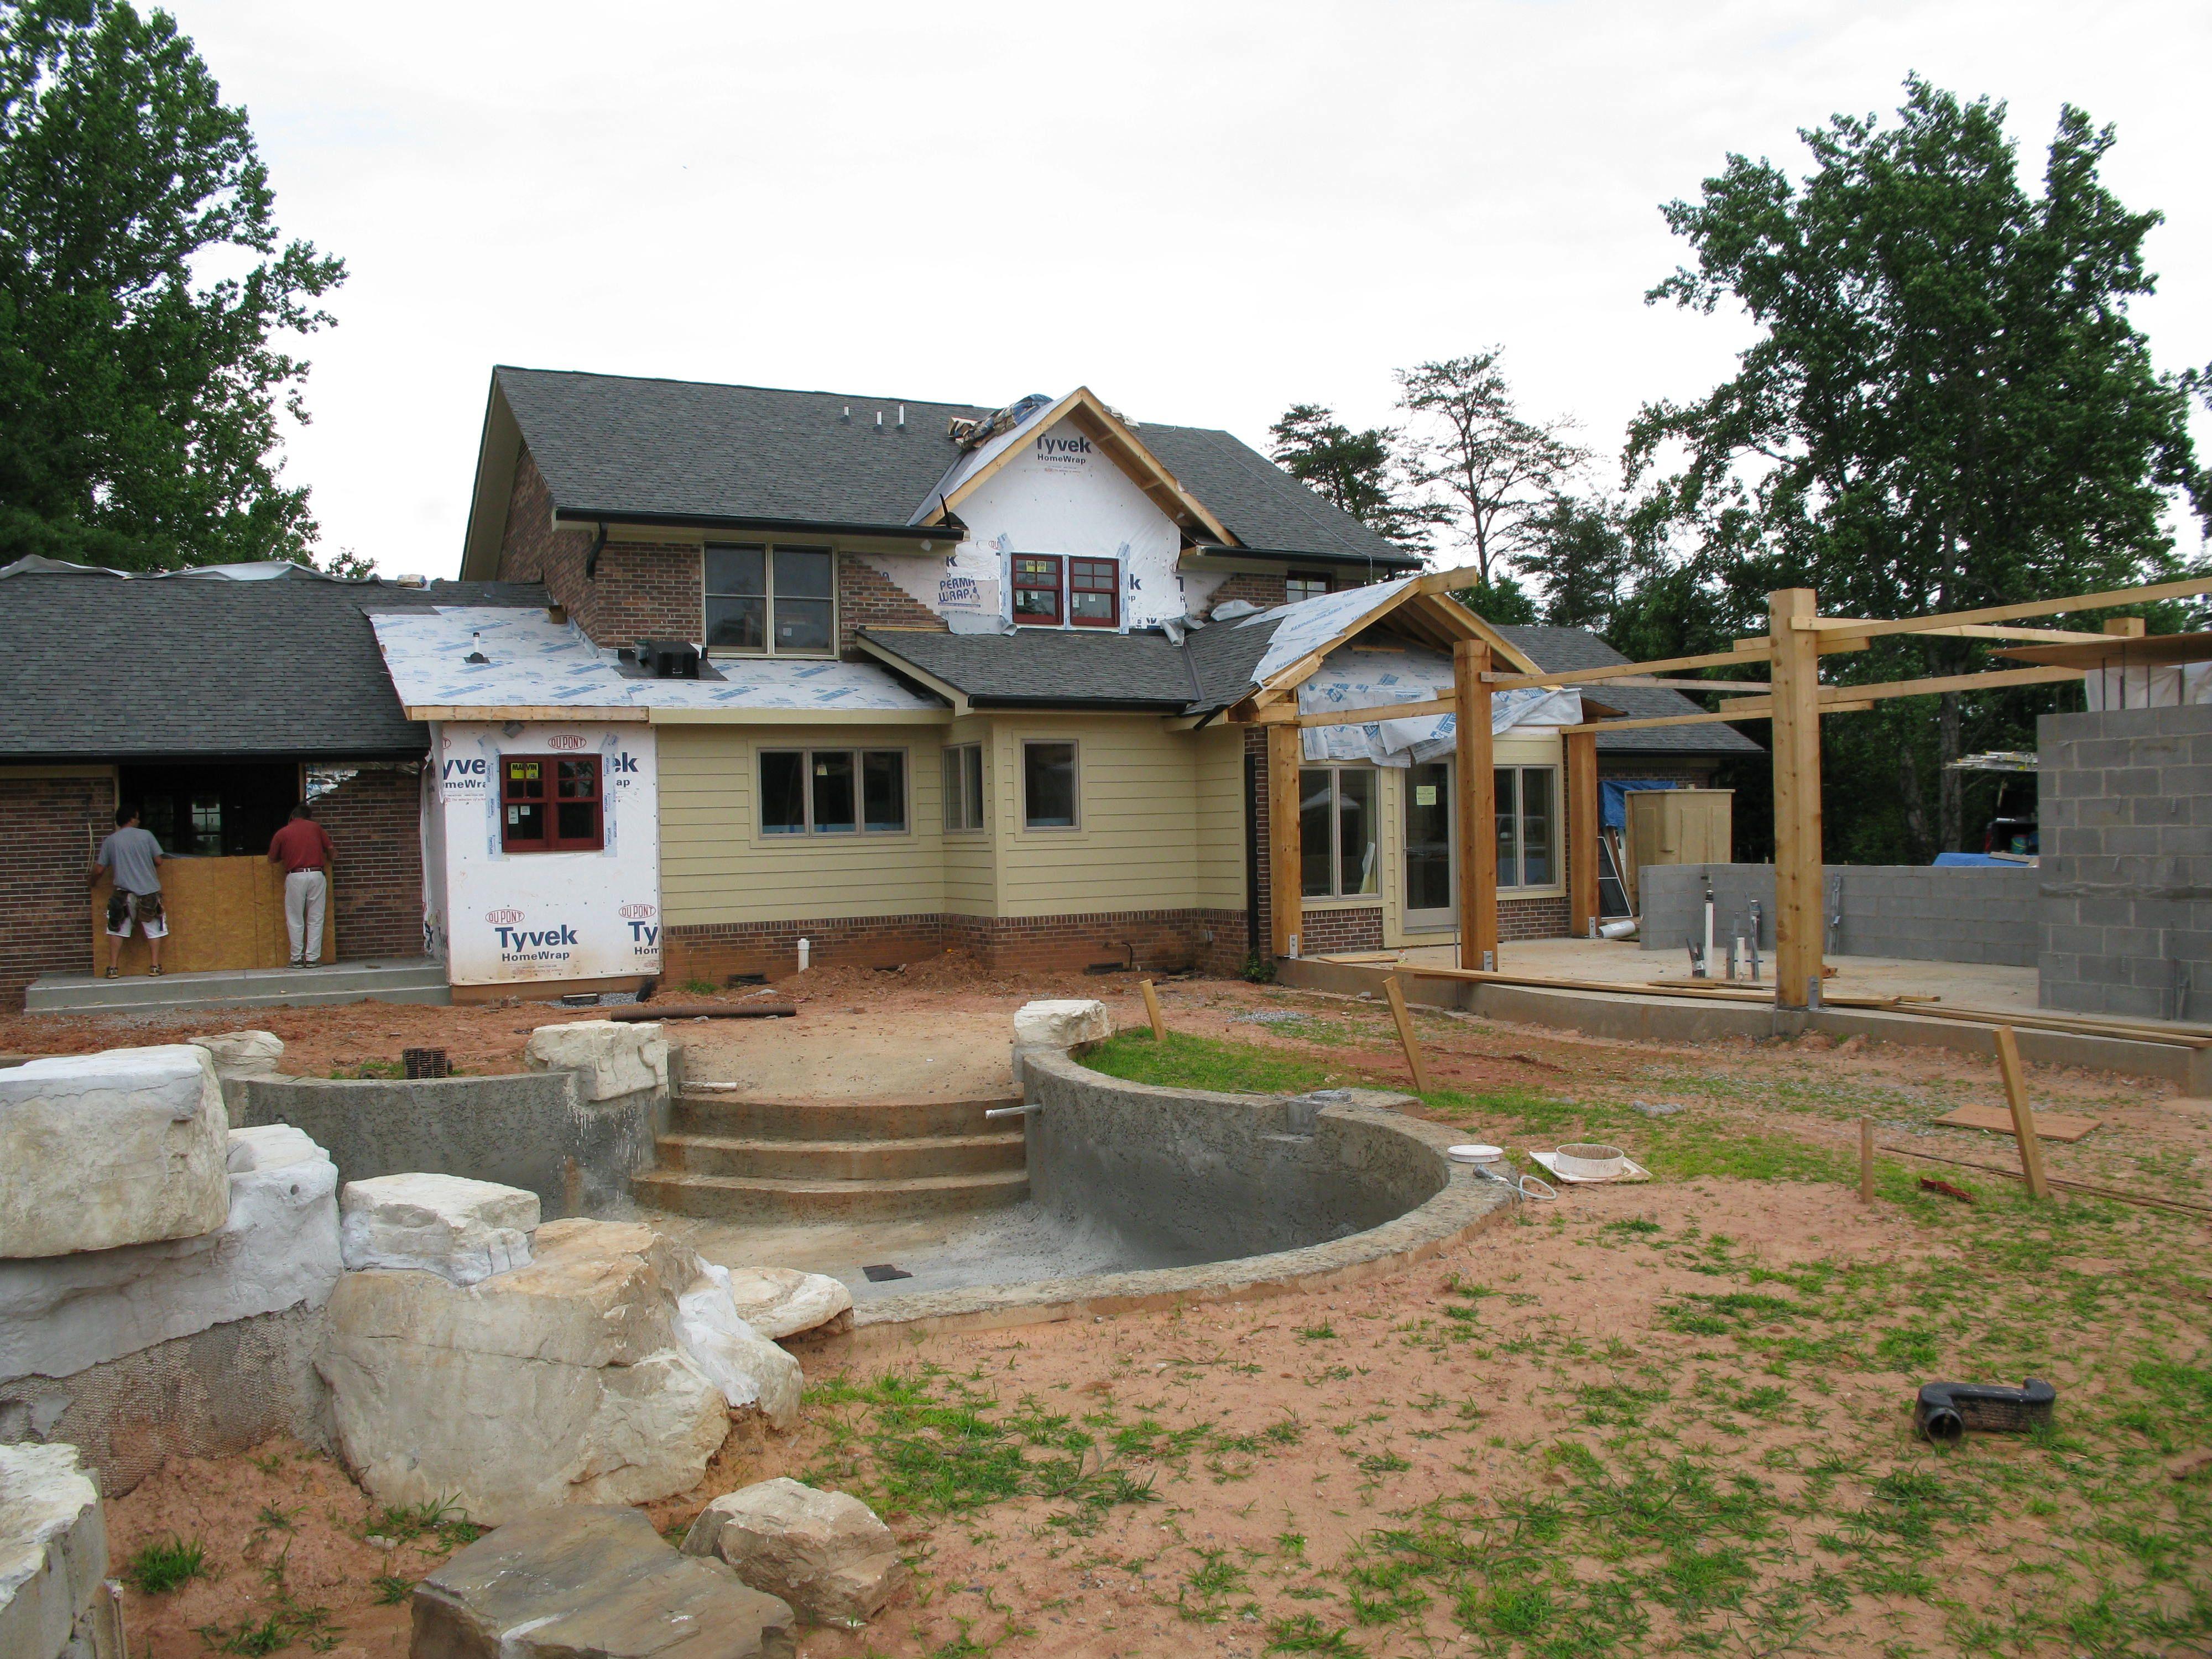 Are you ready to add a custom #SwimmingPool to your beautiful home? #Lowcountry http://lowcountrycustompoolandspa.com/splash/